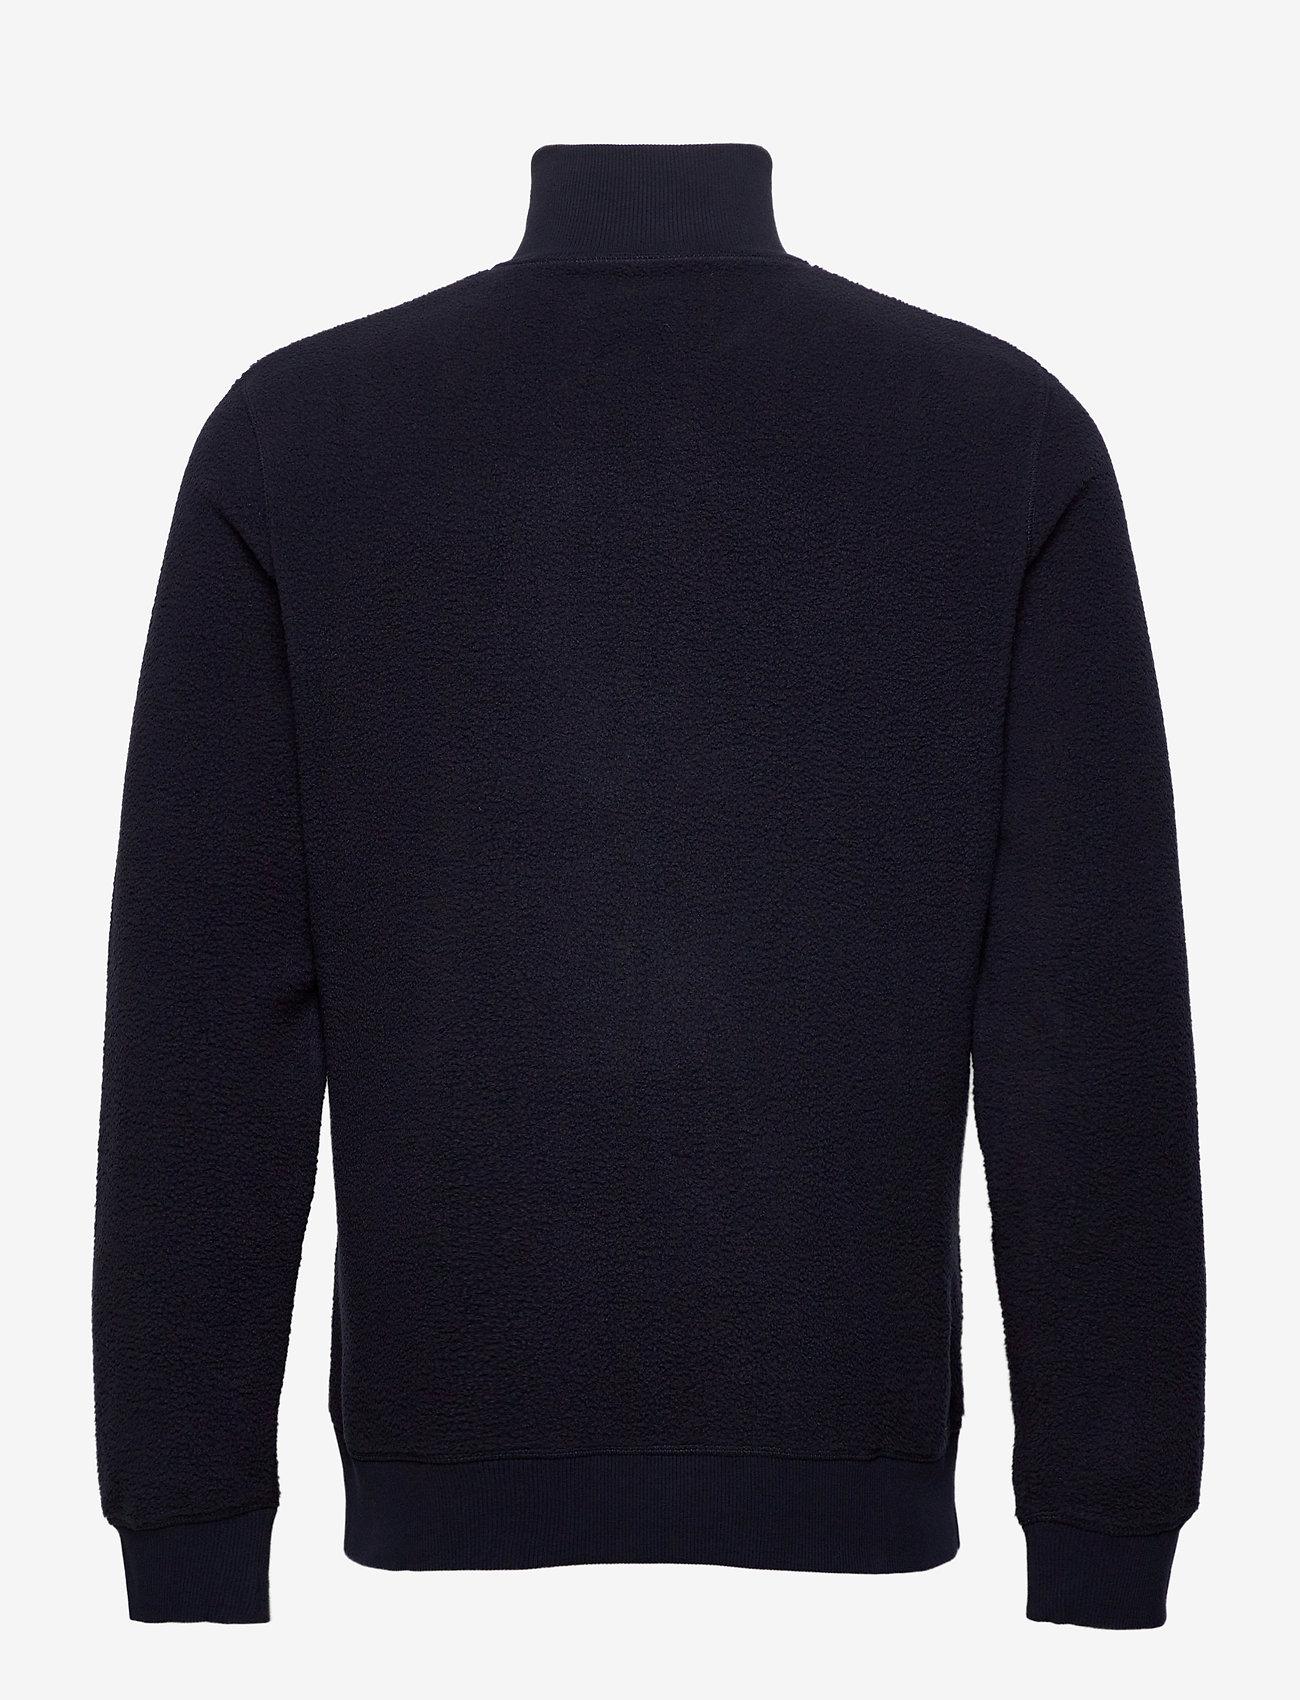 Samsøe Samsøe Anker half zip 11205 - Sweatshirts SKY CAPTAIN - Menn Klær